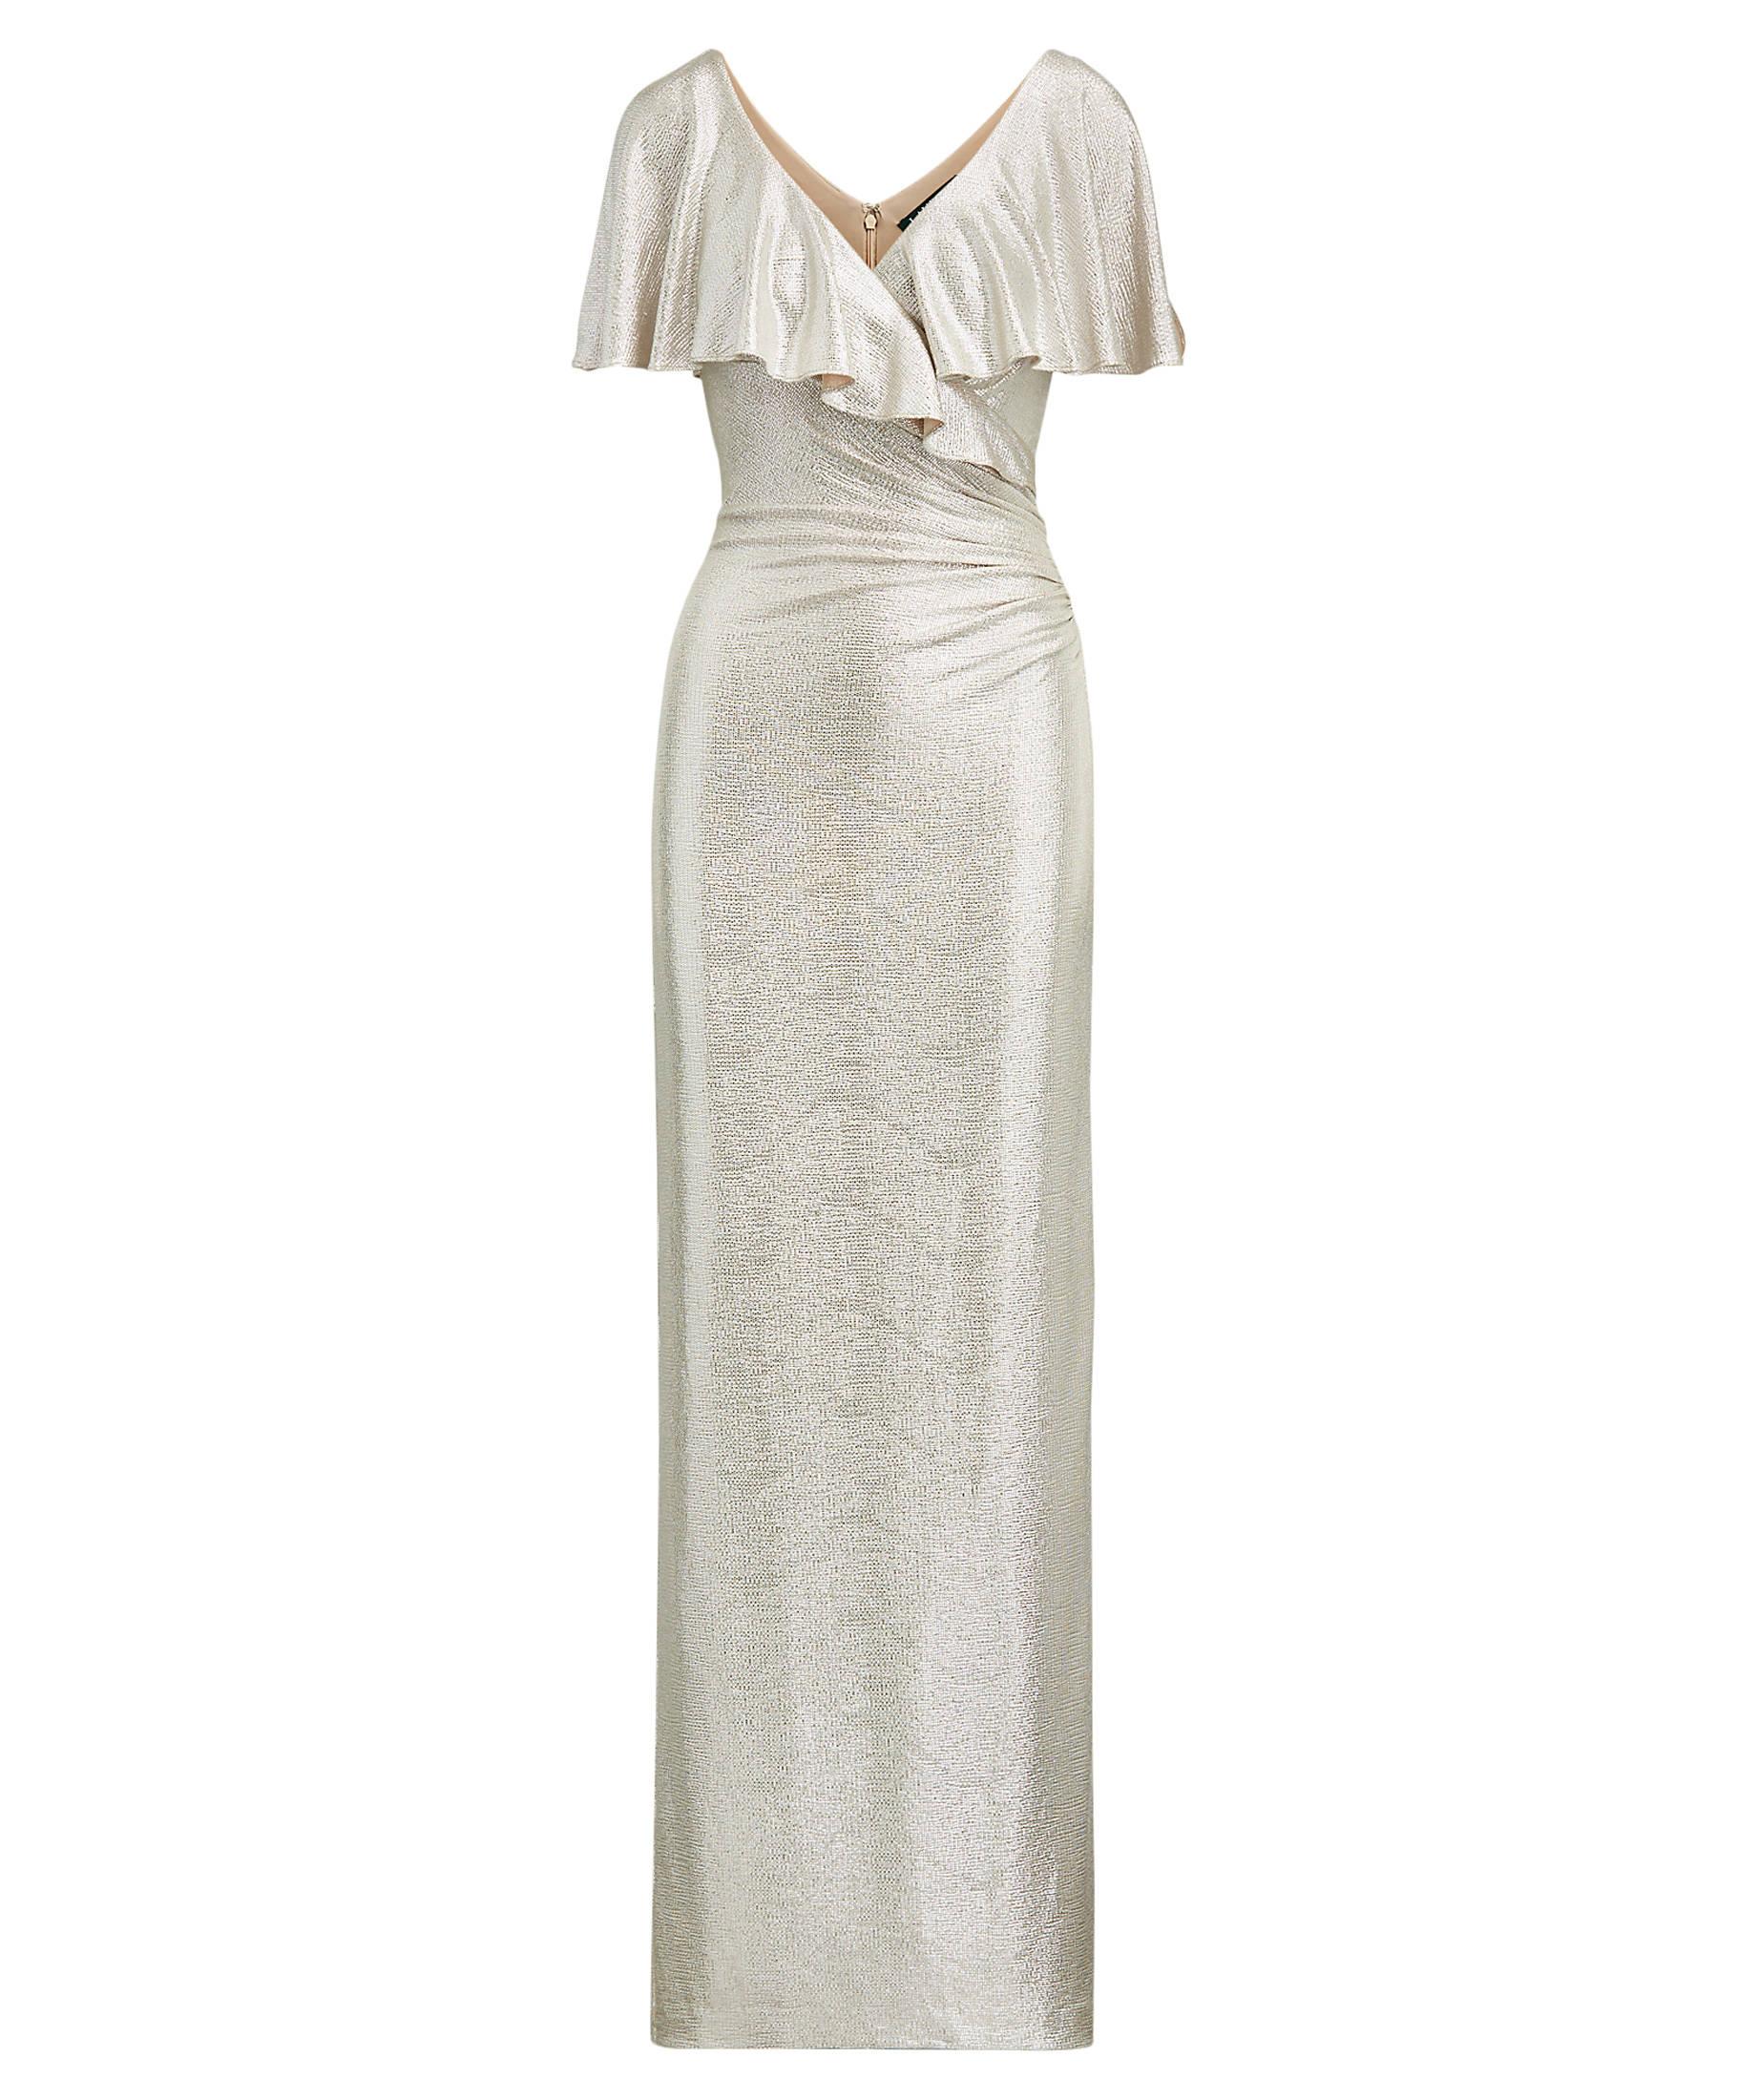 Lauren Ralph Lauren Damen Abendkleid  engelhorn